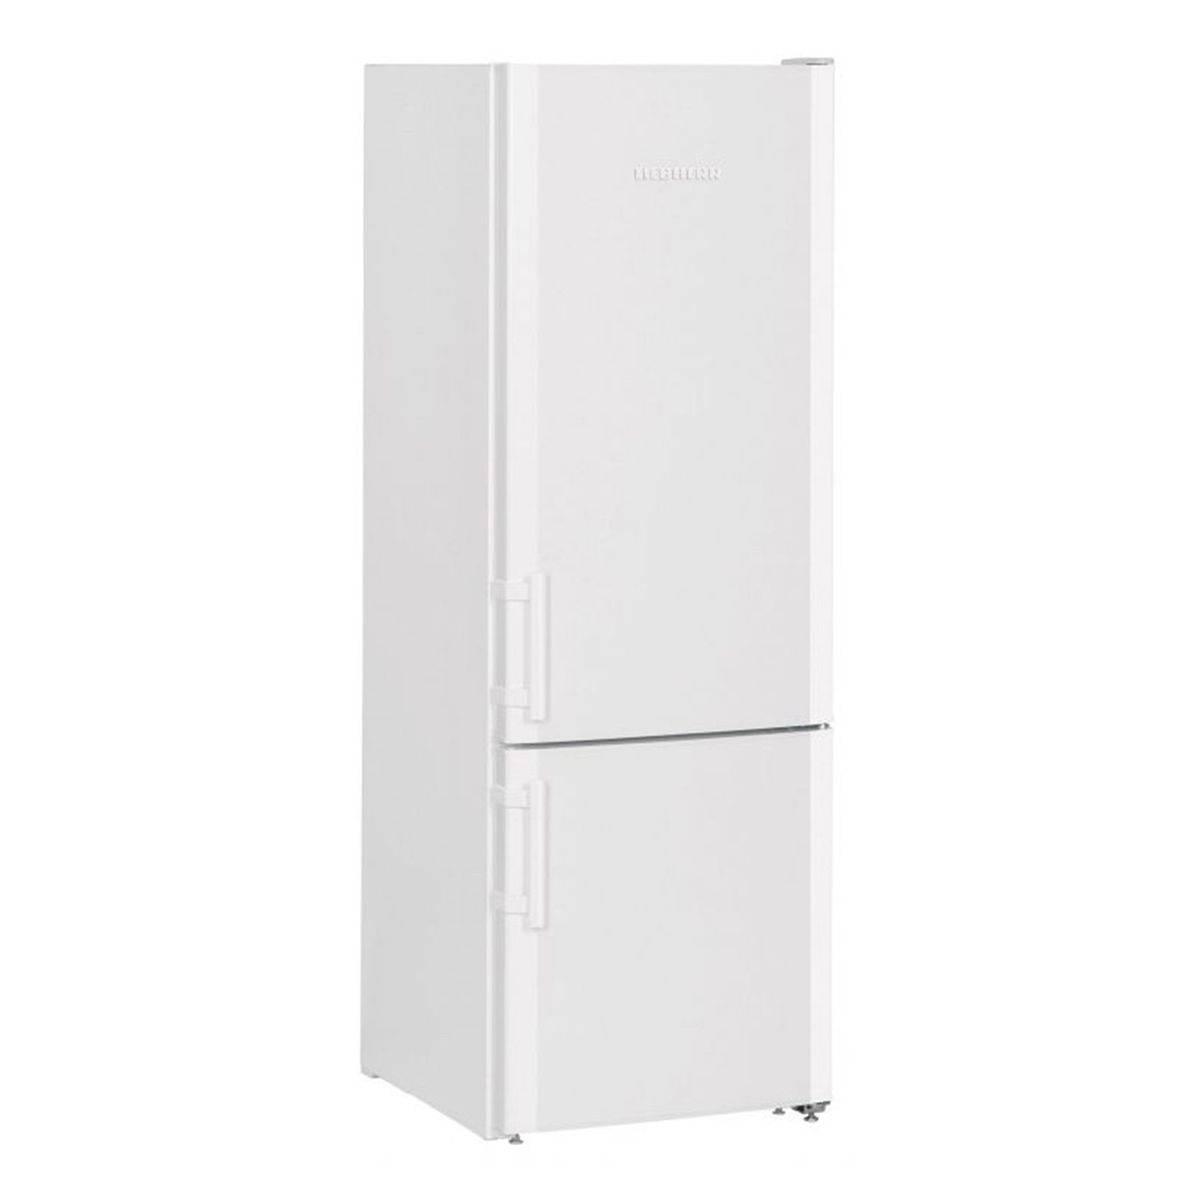 Liebherr Réfrigérateur combiné SmartFrostComfort CU280 - LIEBHERR